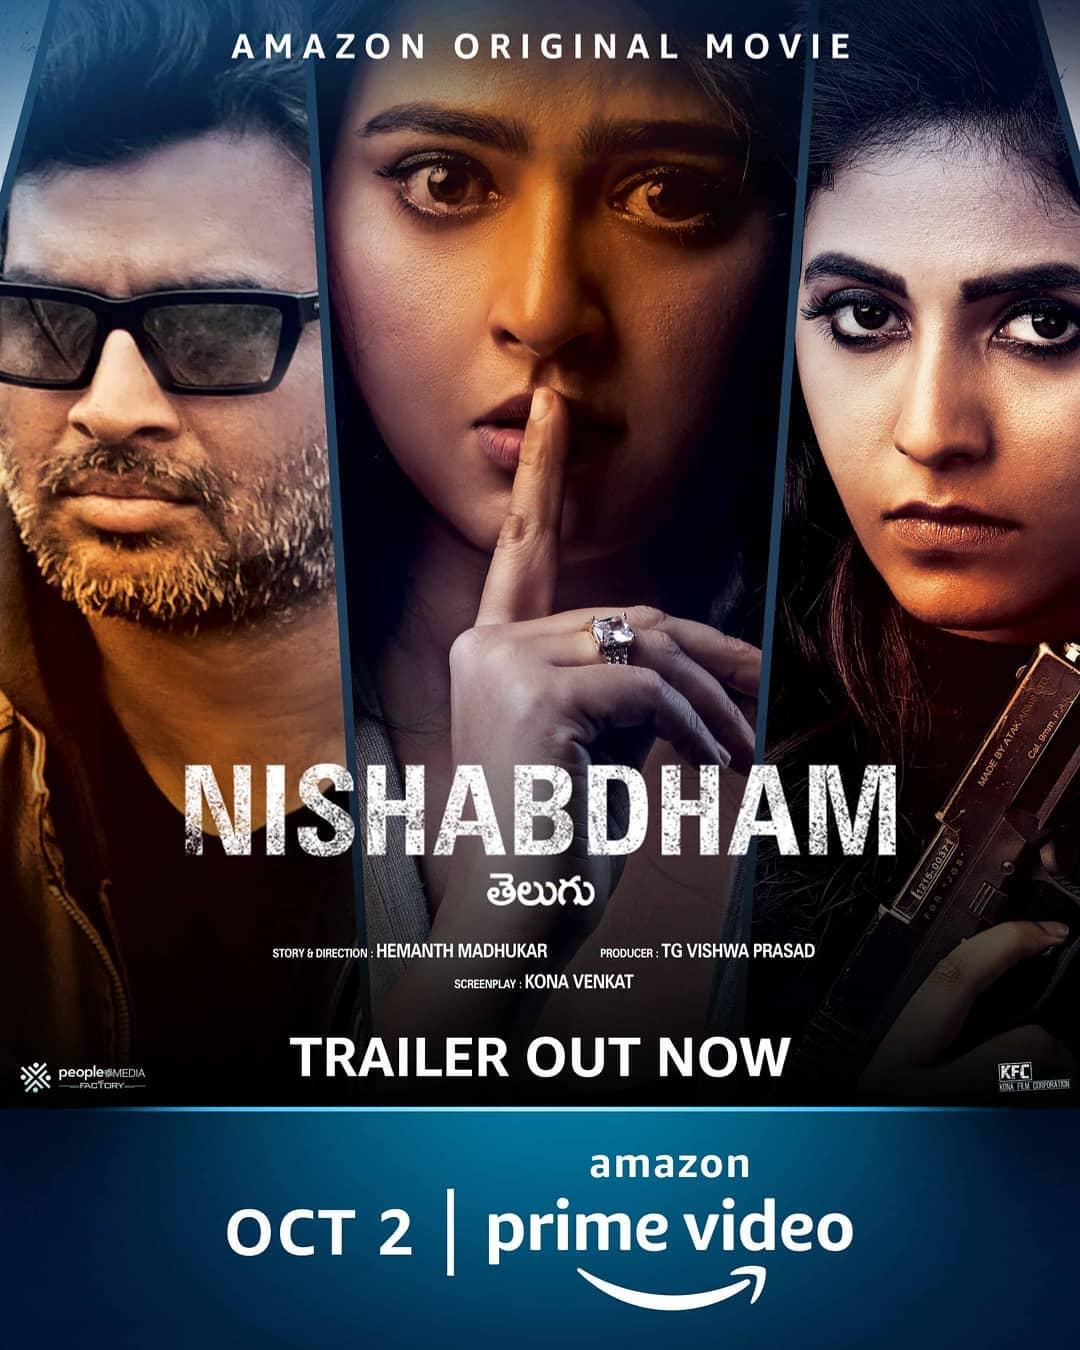 TamilRockers Leaked Nishbdham And Ka Pae Ranasingam Within Hours Of OTT Release – 2021